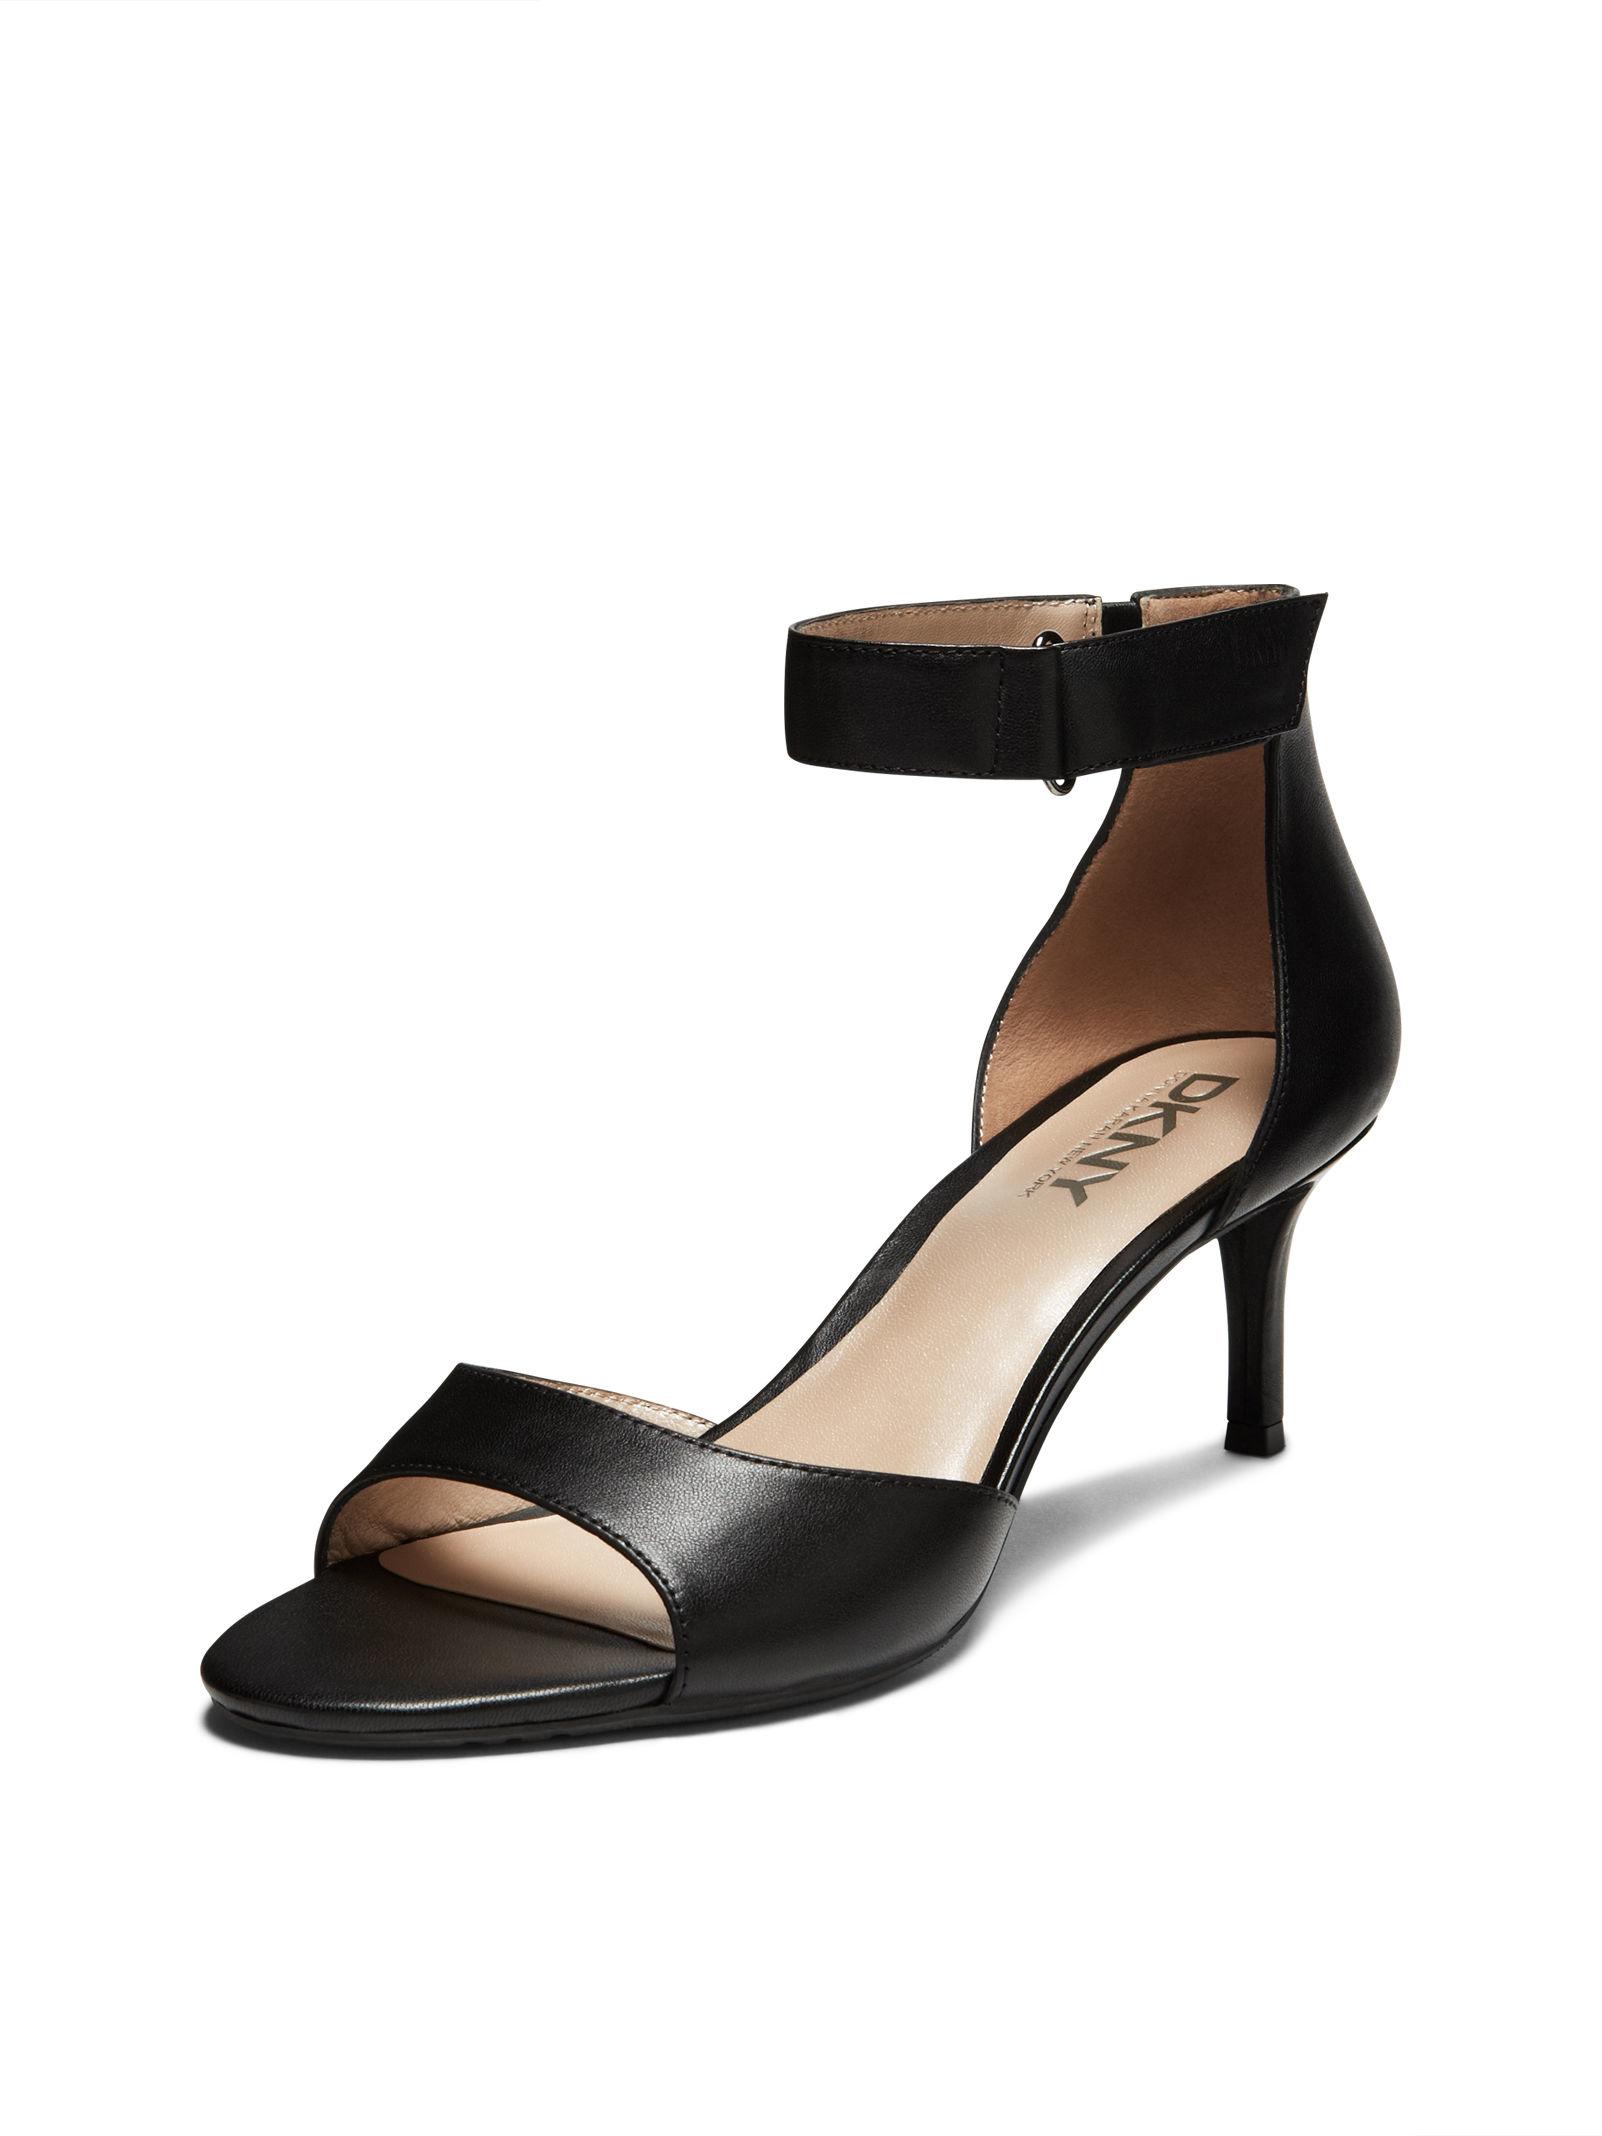 Dkny Gianna Kitten Heel Sandal in Black | Lyst